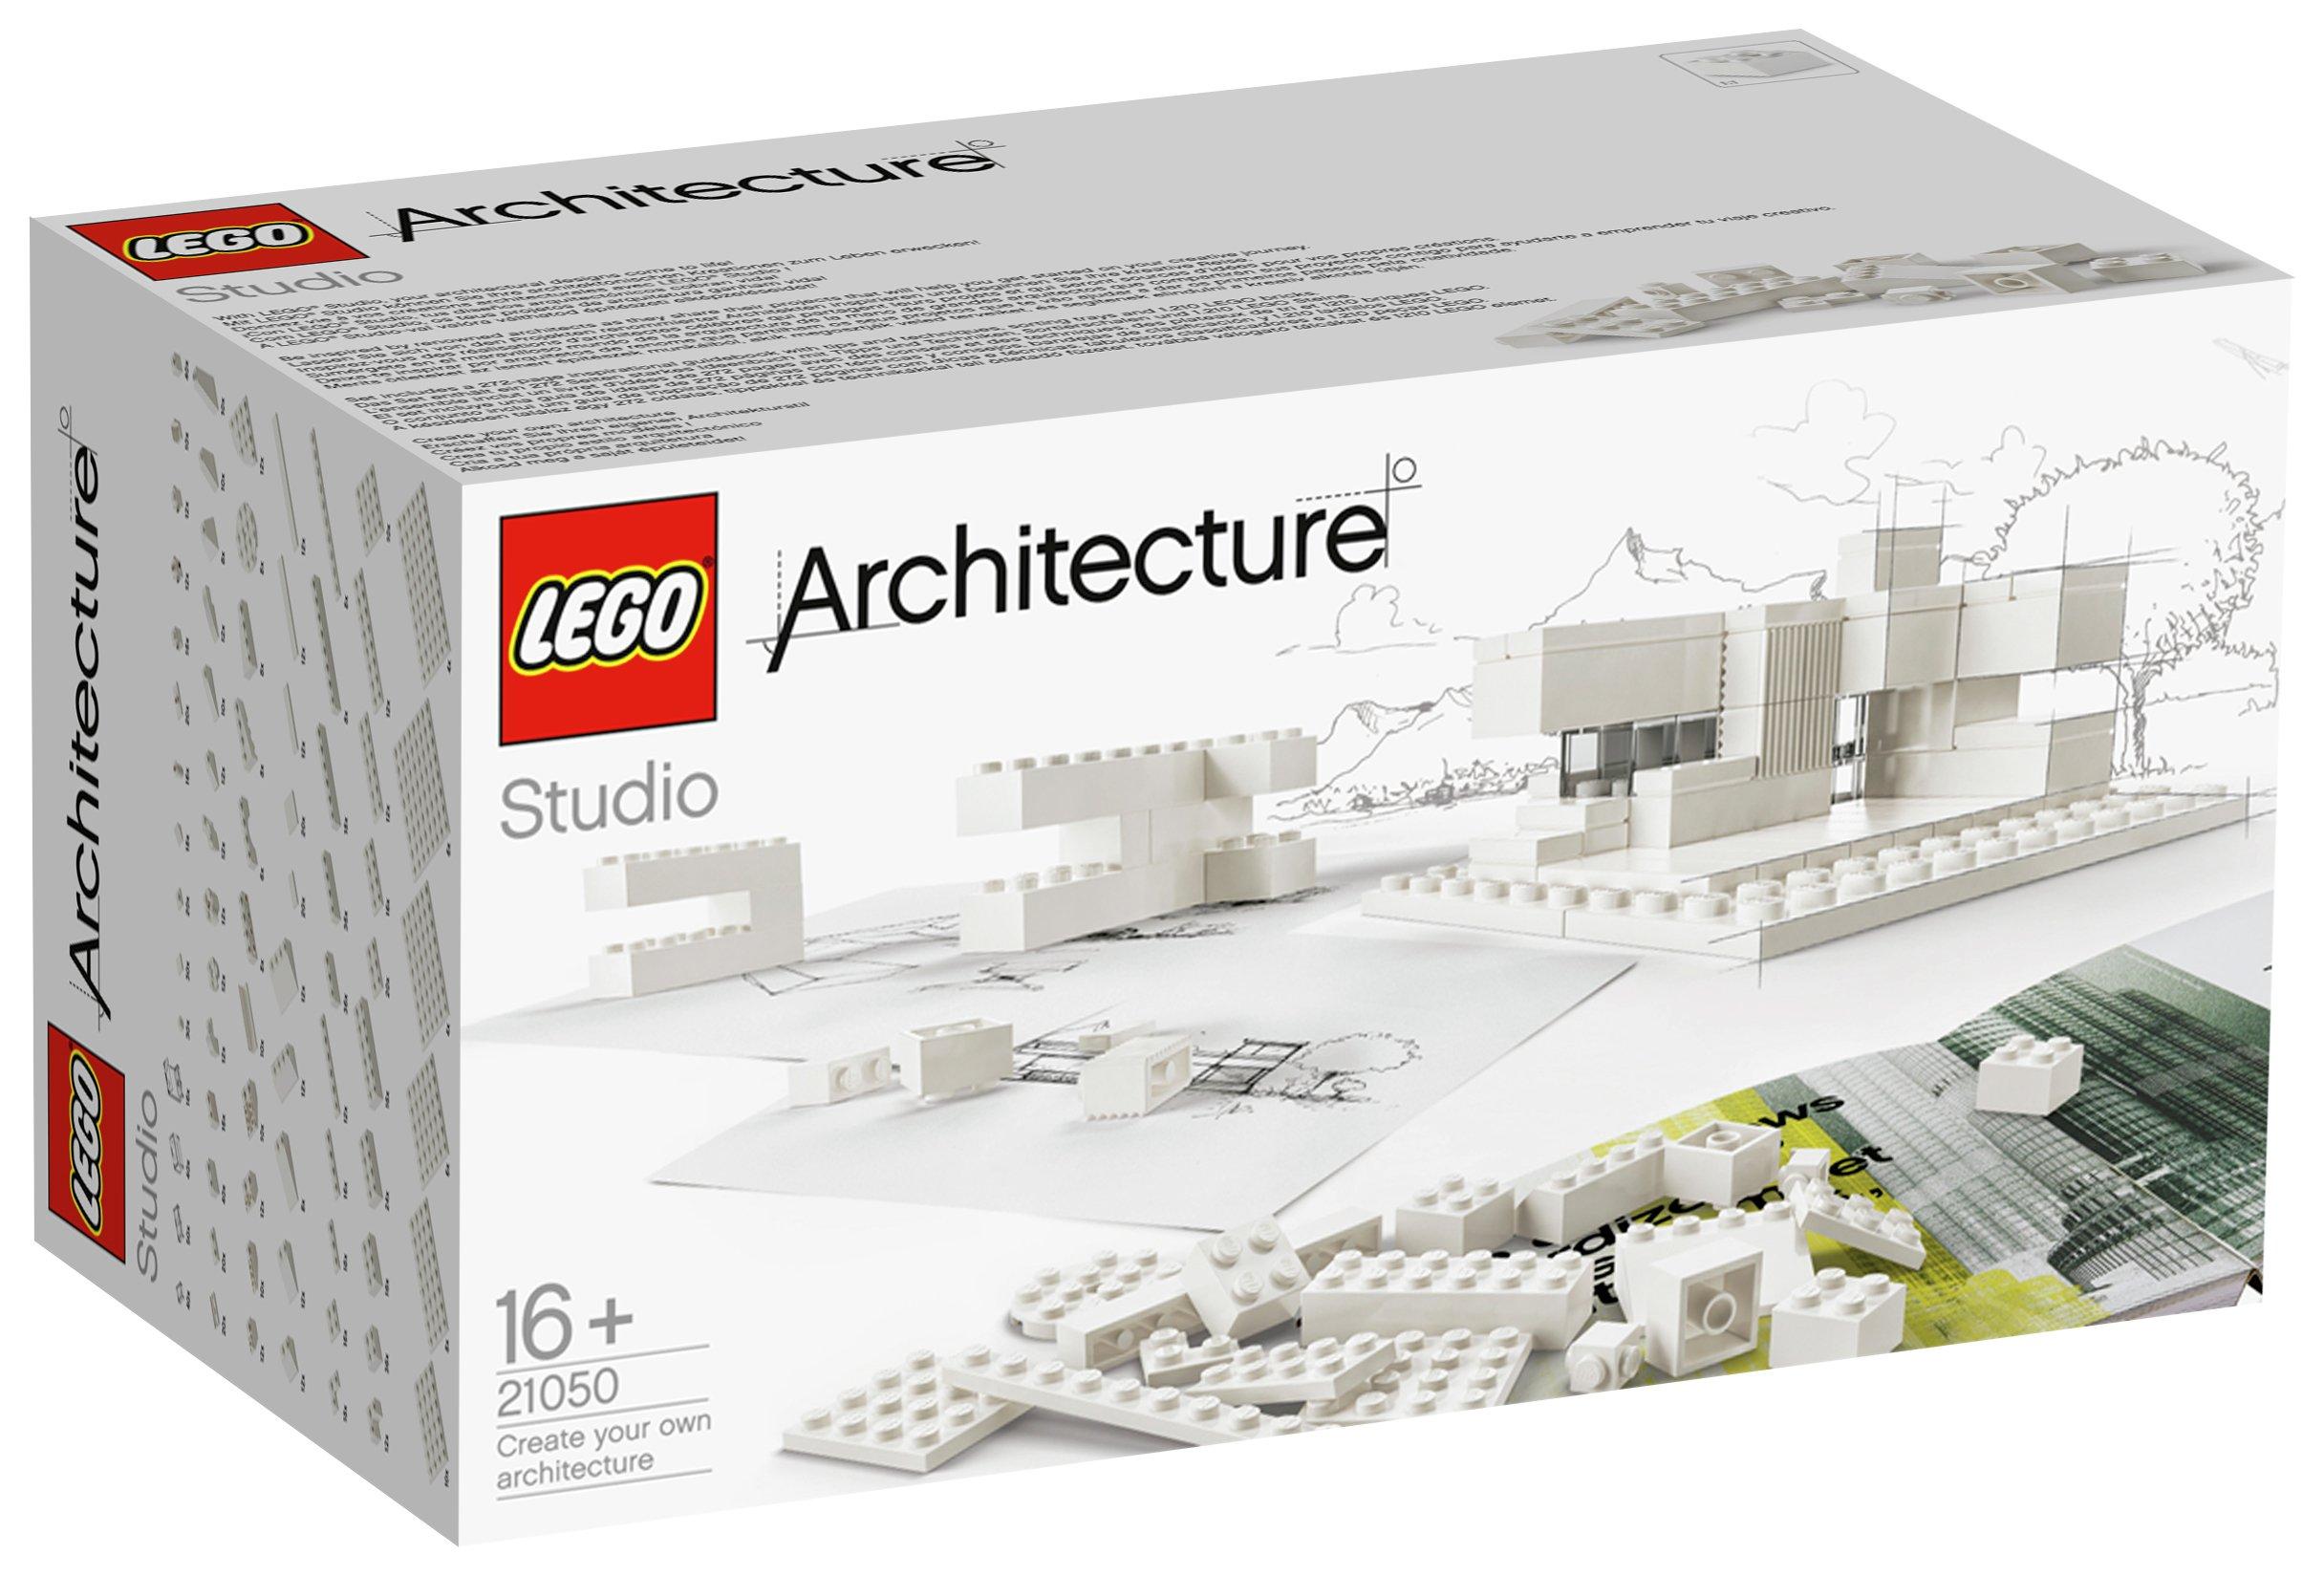 LEGO Architecture Studio - 21050.